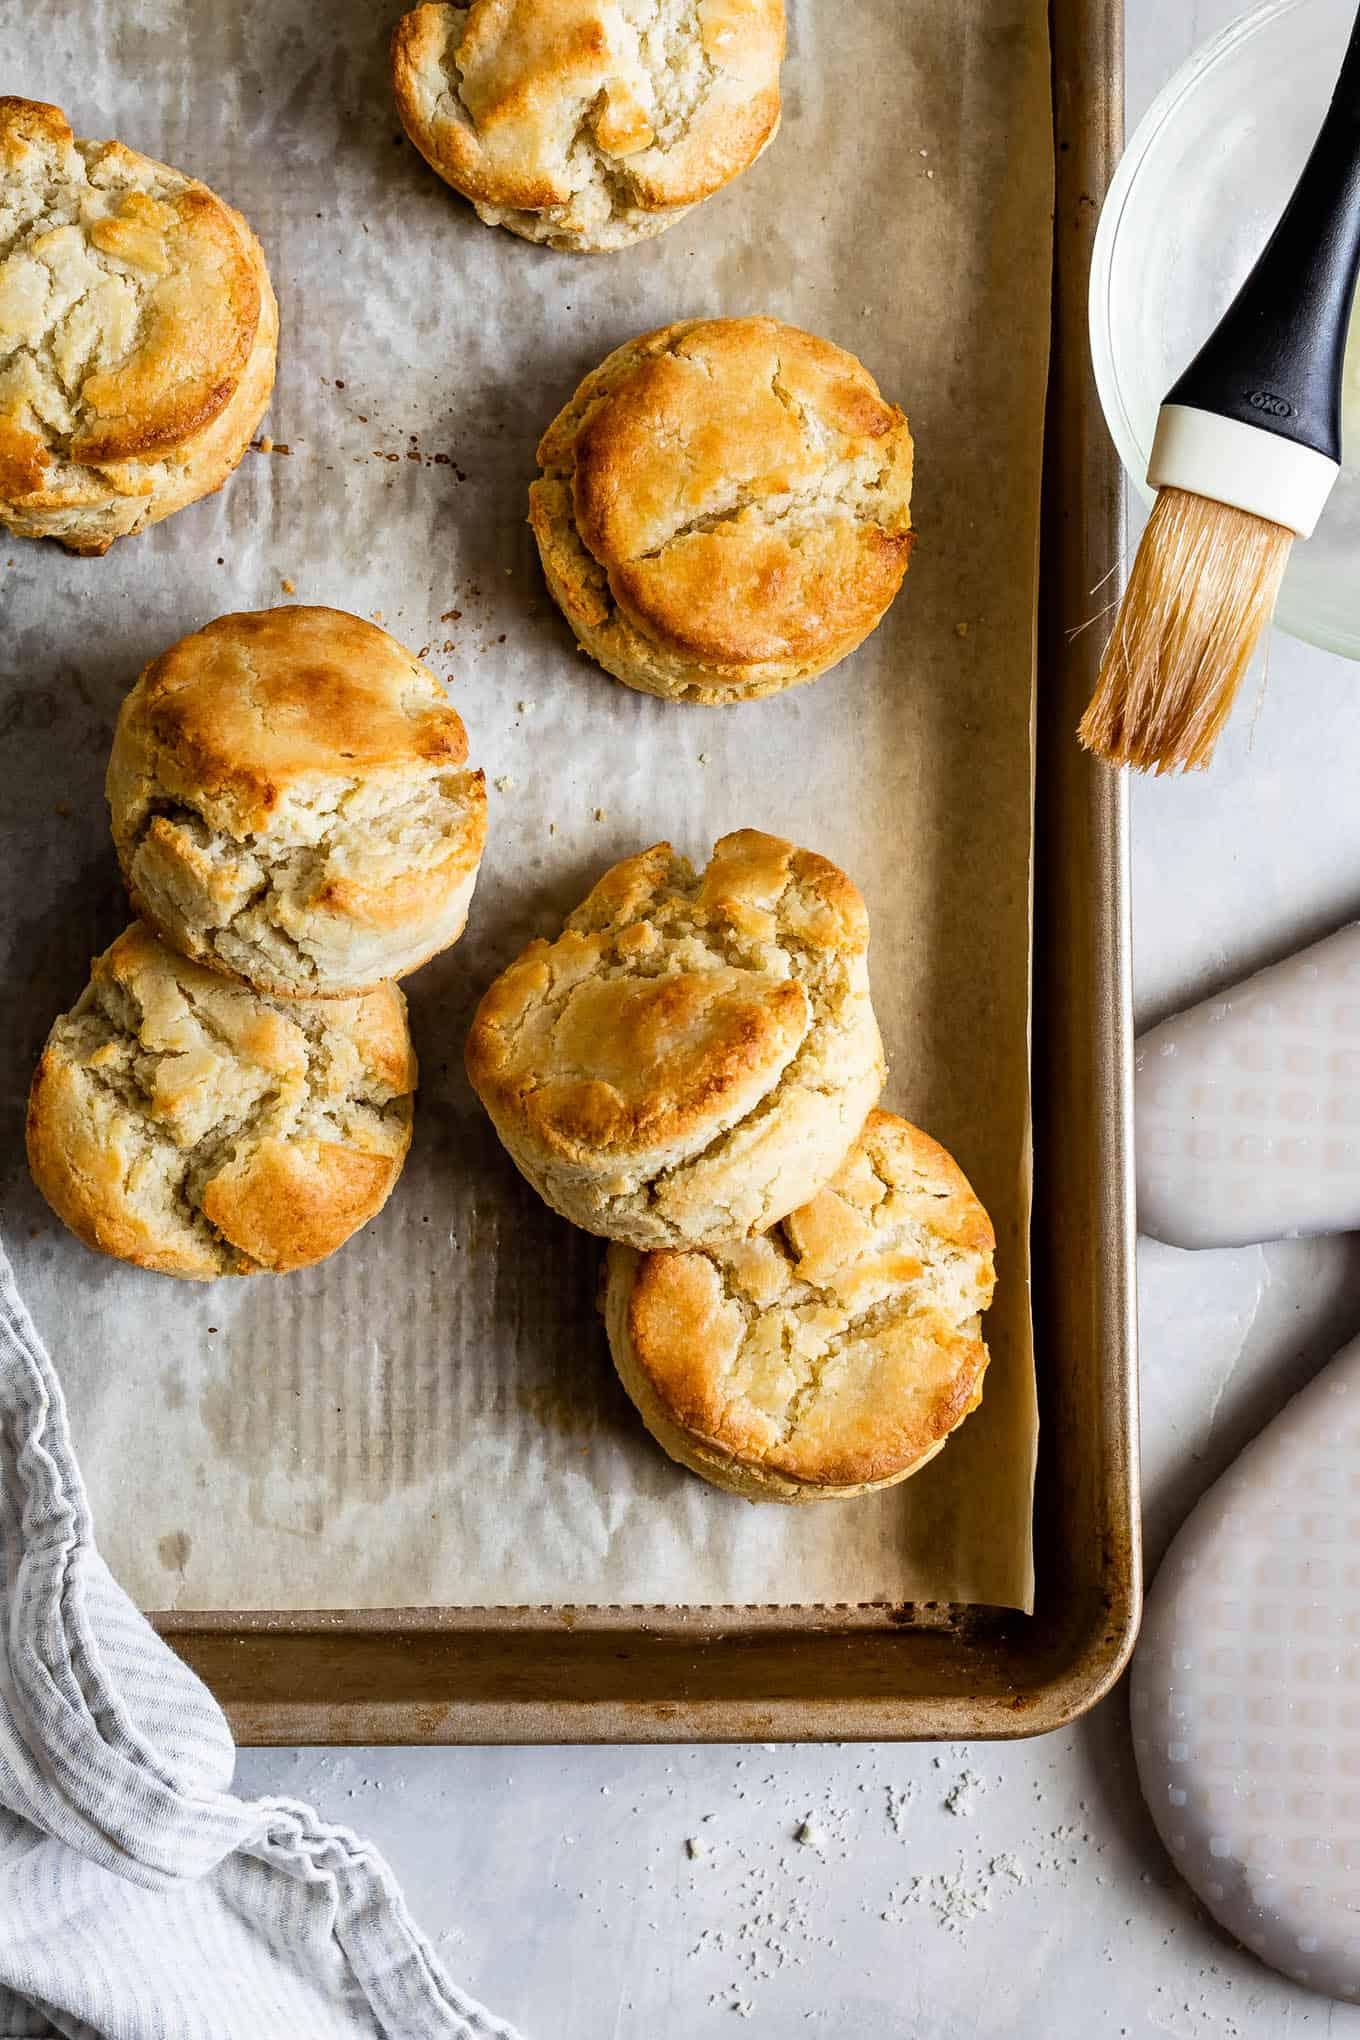 Homemade Gluten-Free Biscuits